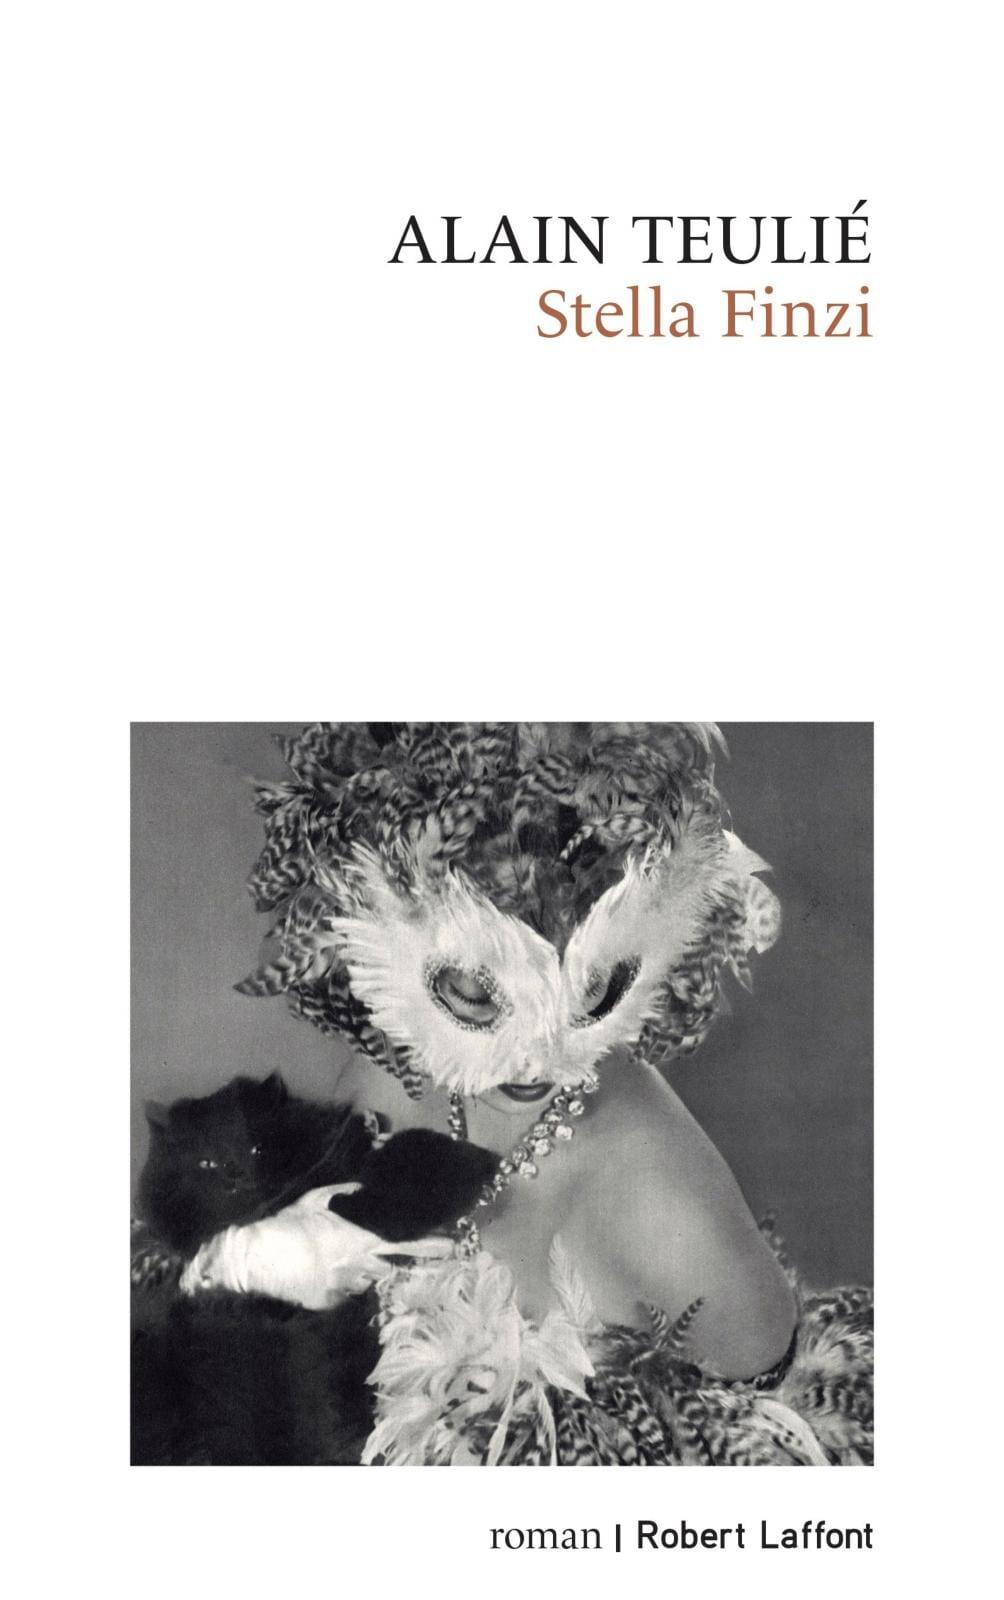 Stella Finzi d'Alain Teulié